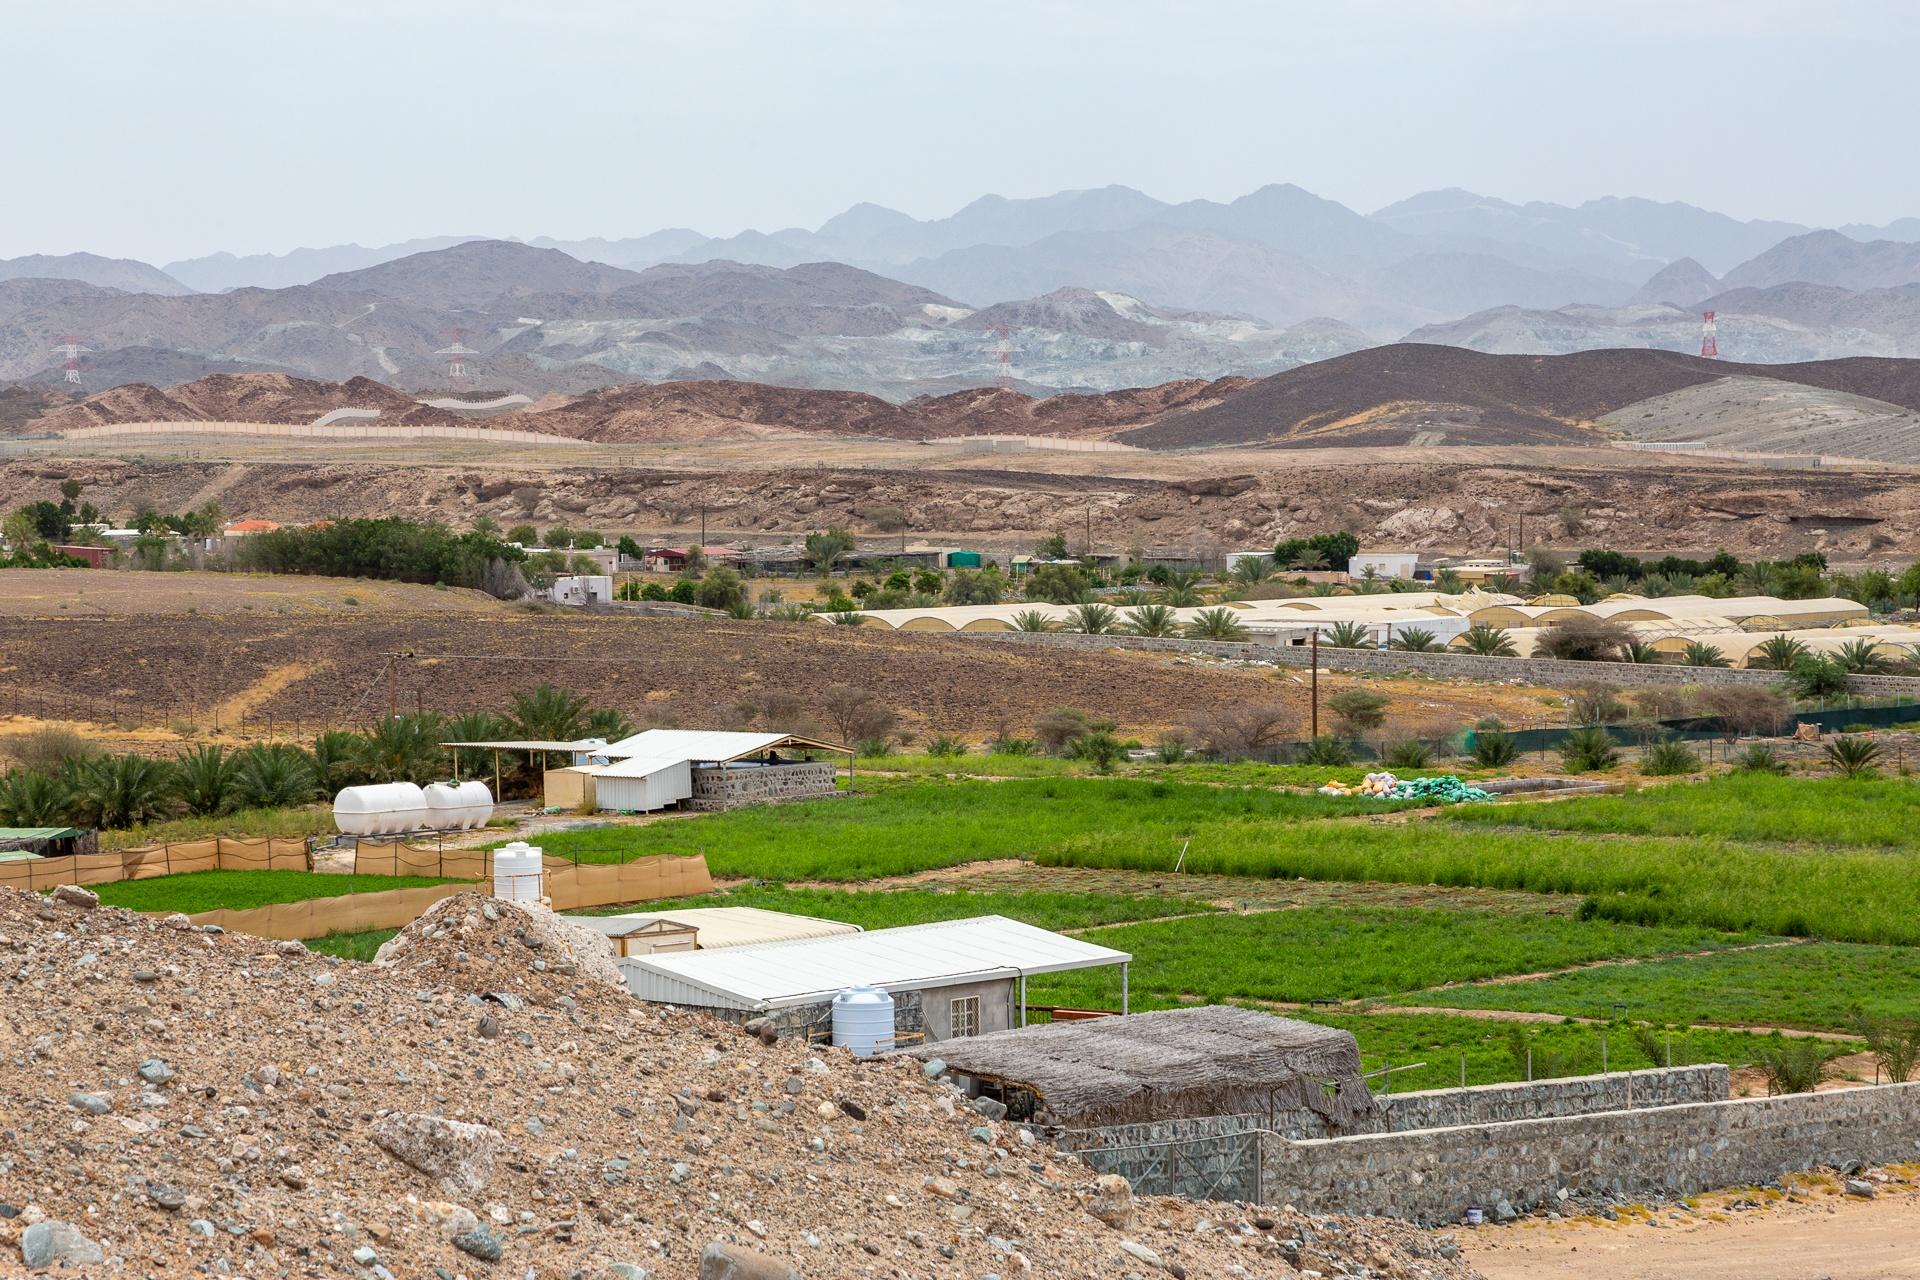 Village in the Hajar Mountains, Sharjah